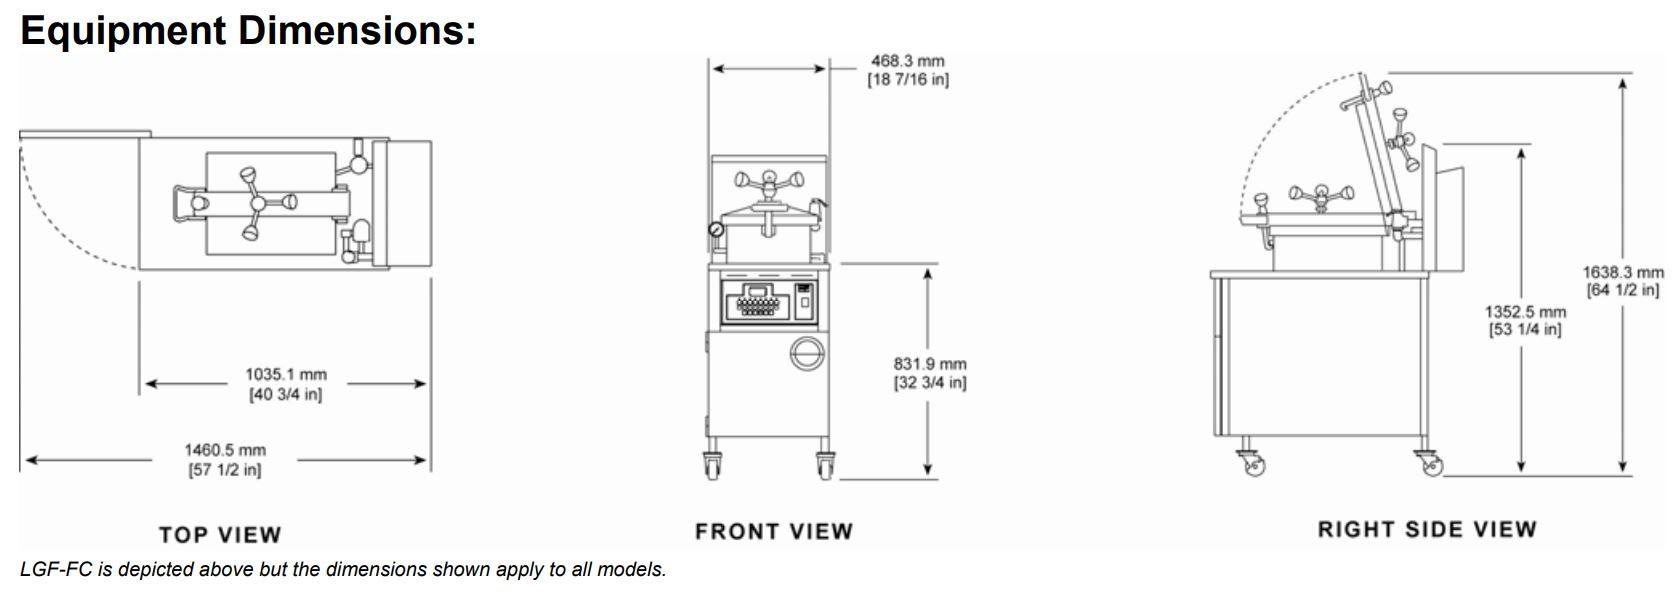 BKI LGF-F Gas Pressure Fryer with Manual Controls